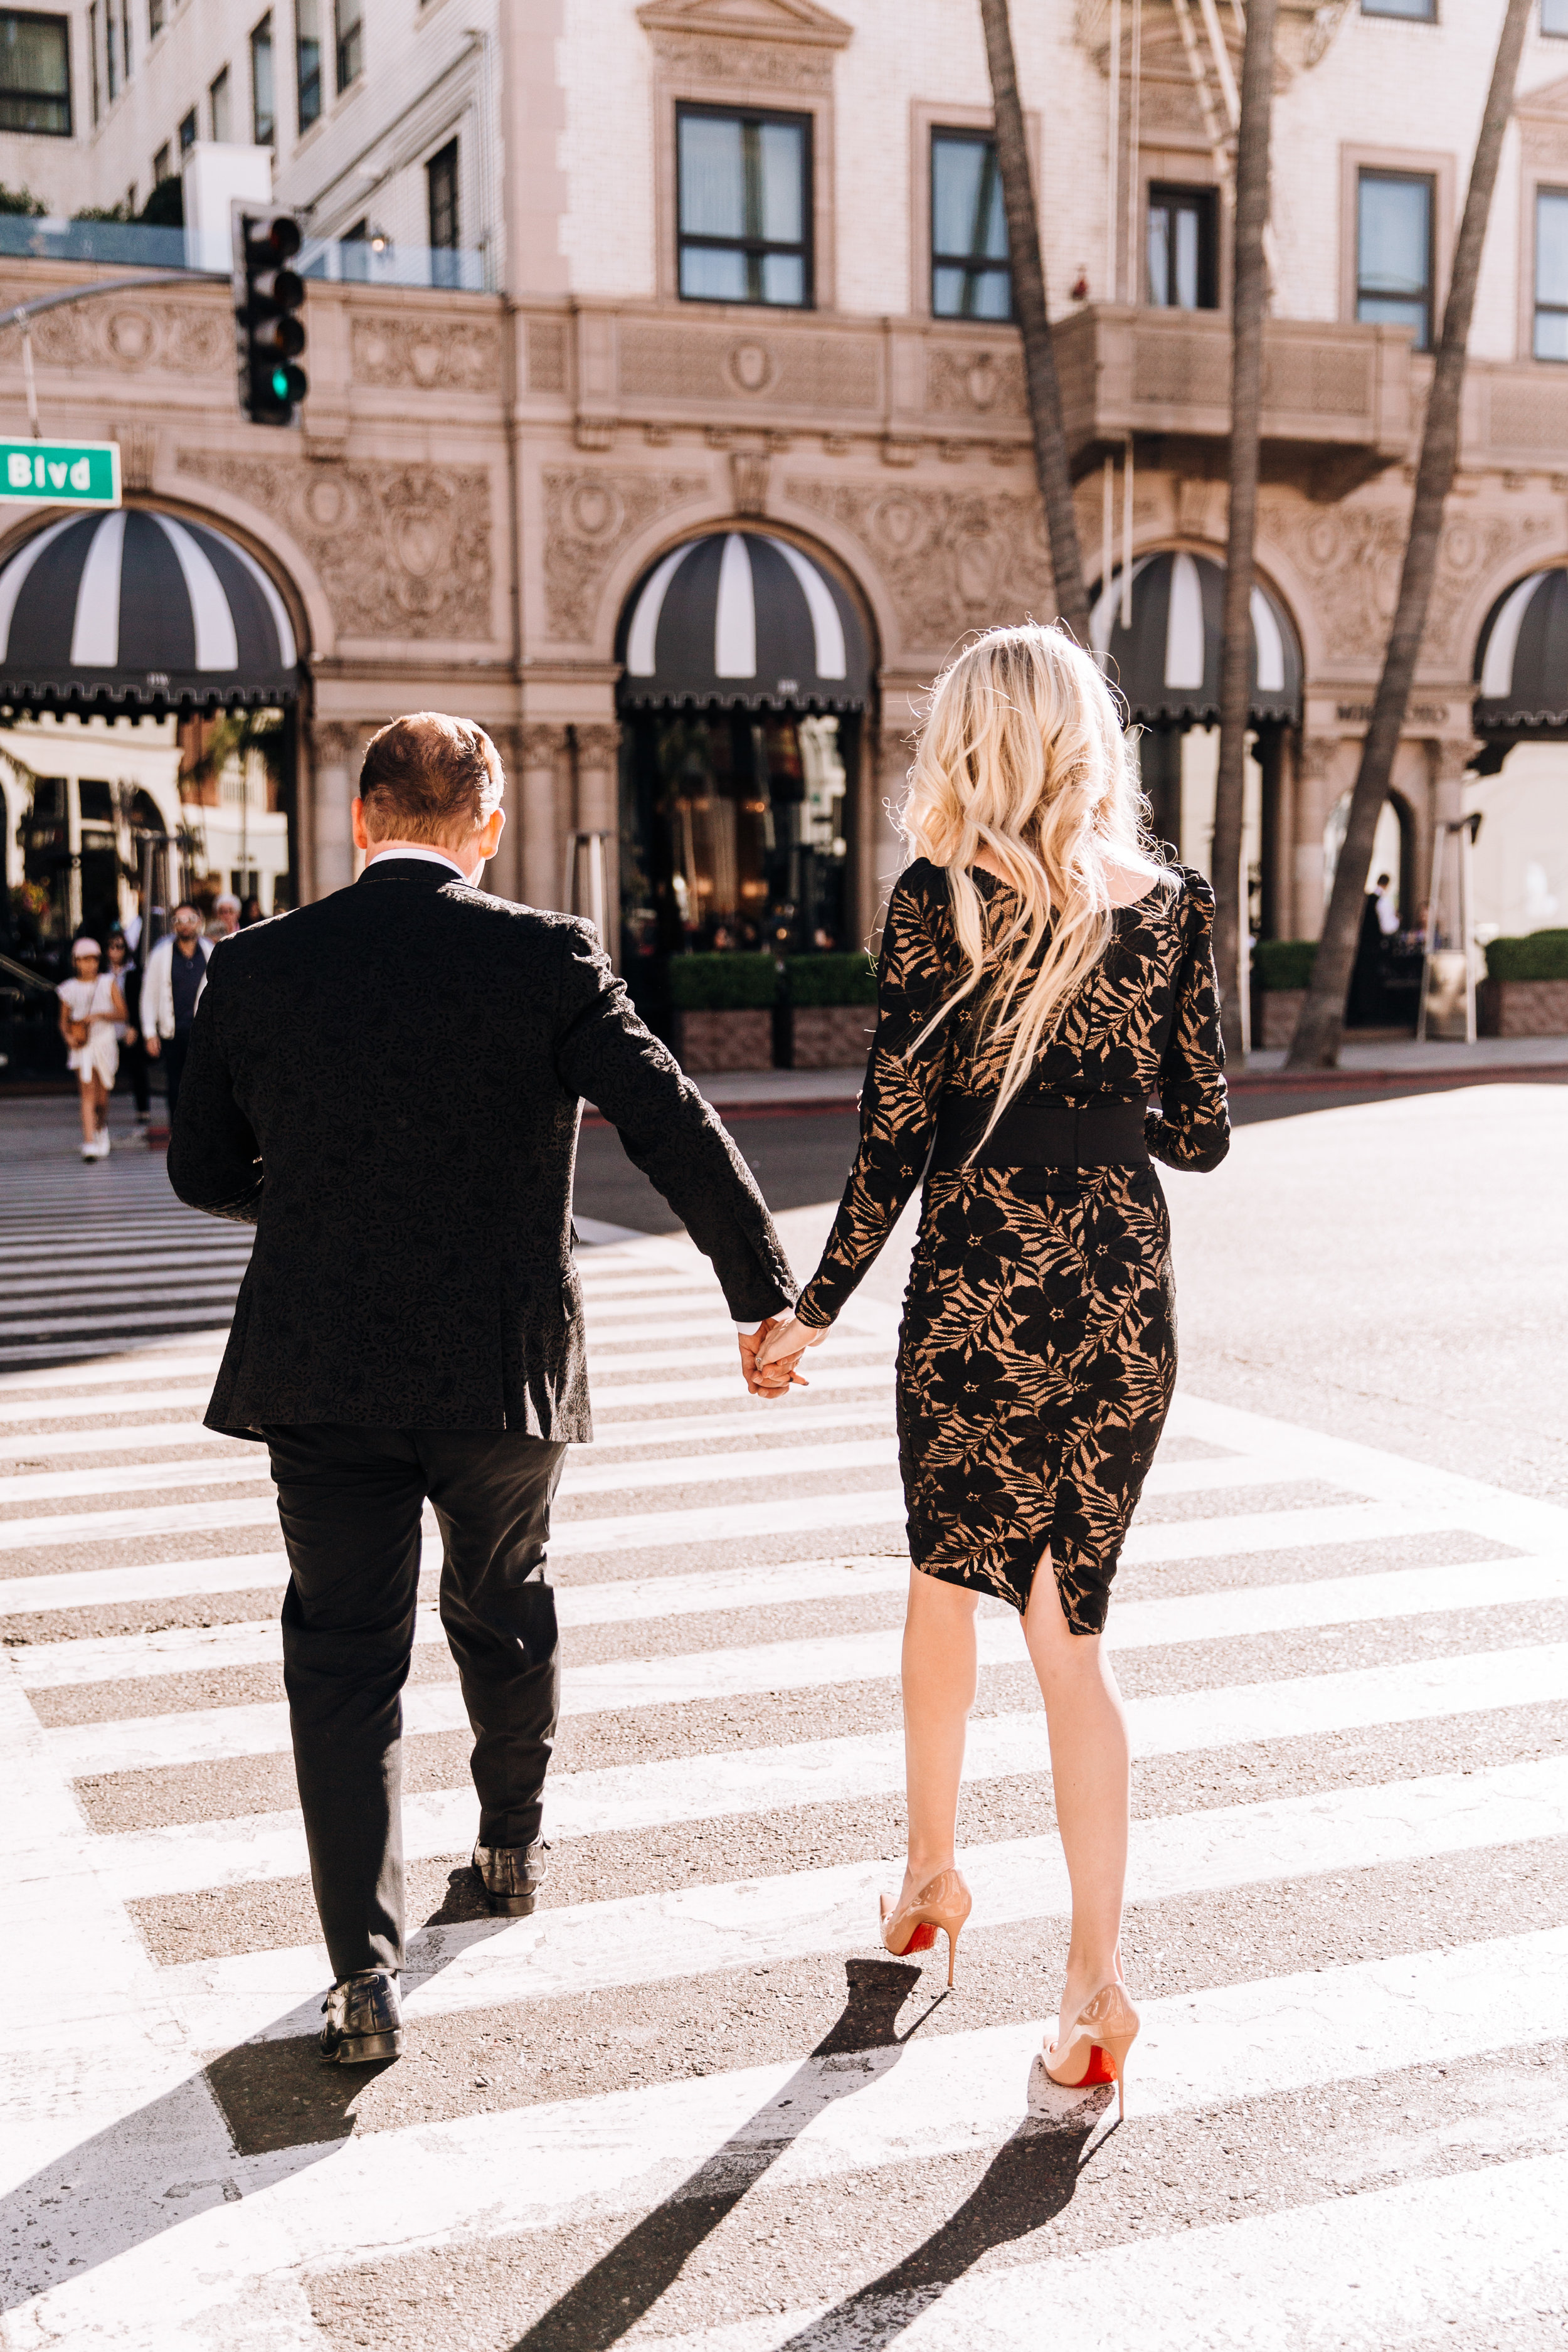 KaraNixonWeddings-BeverlyHills-RodeoDr-Engagement-end.jpg